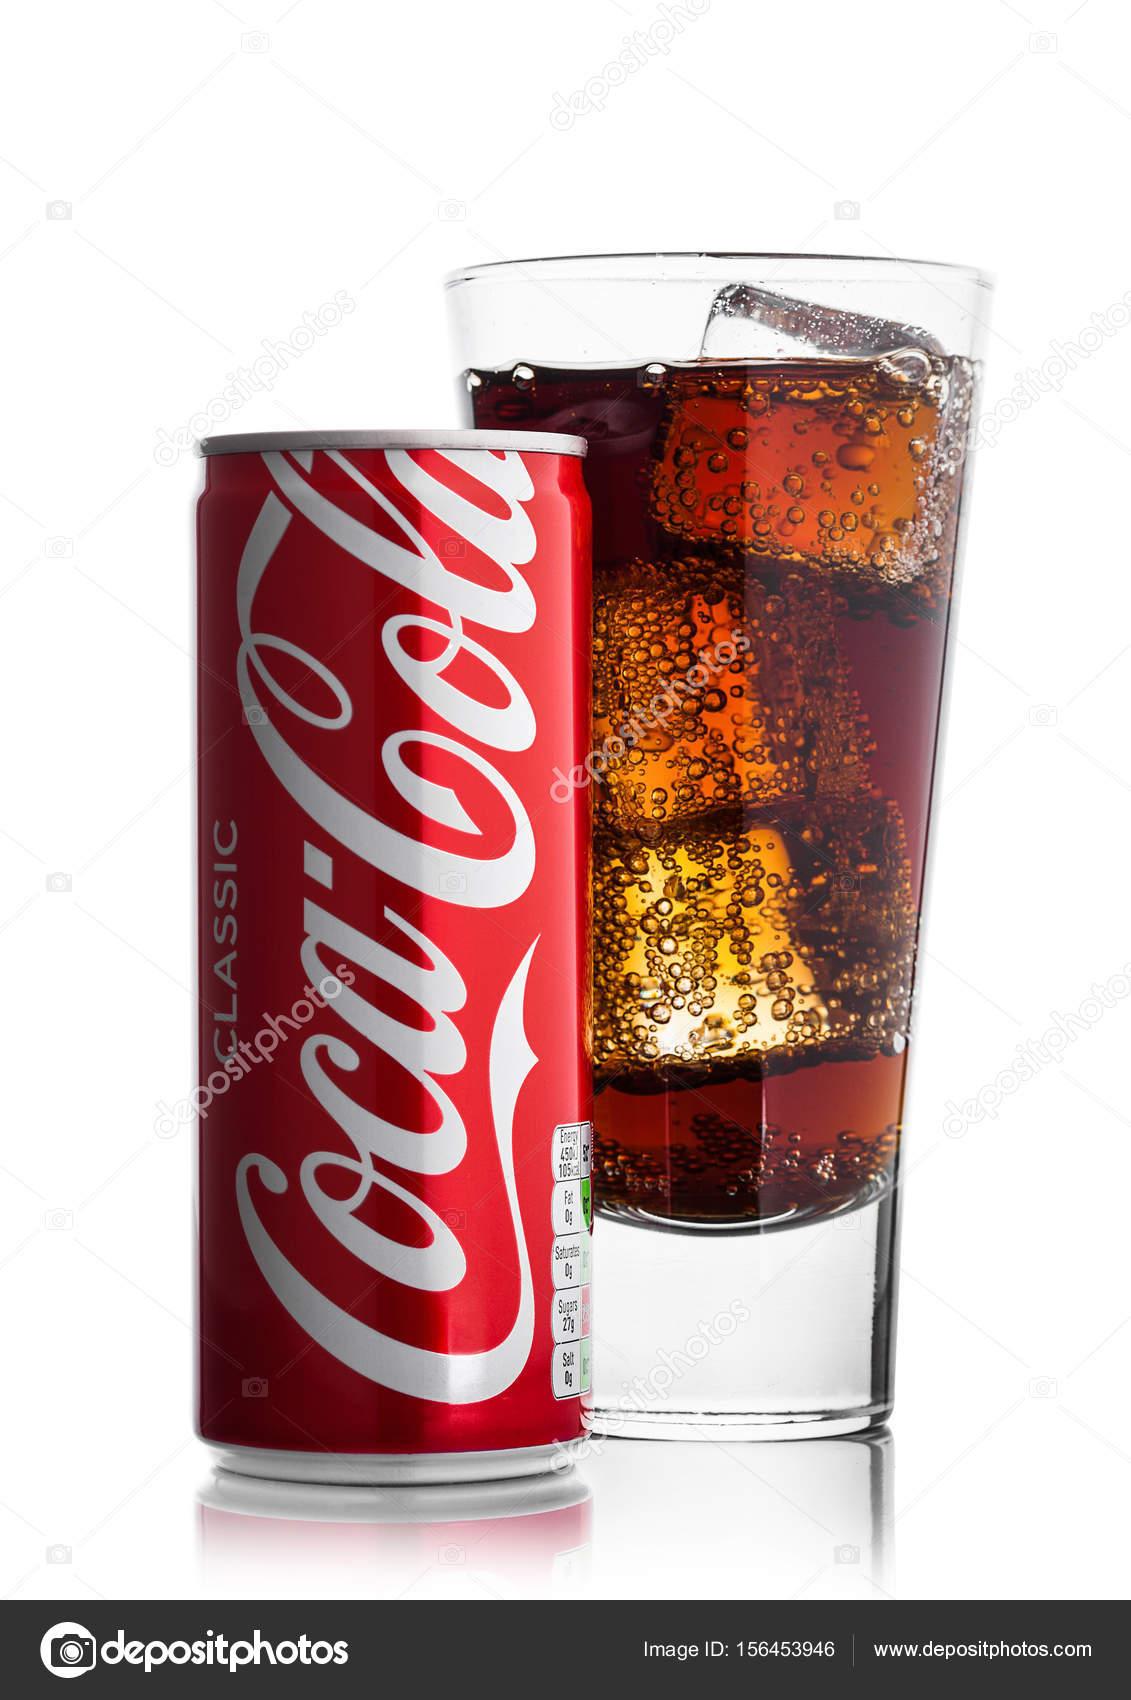 dieta coke pubblicità uk